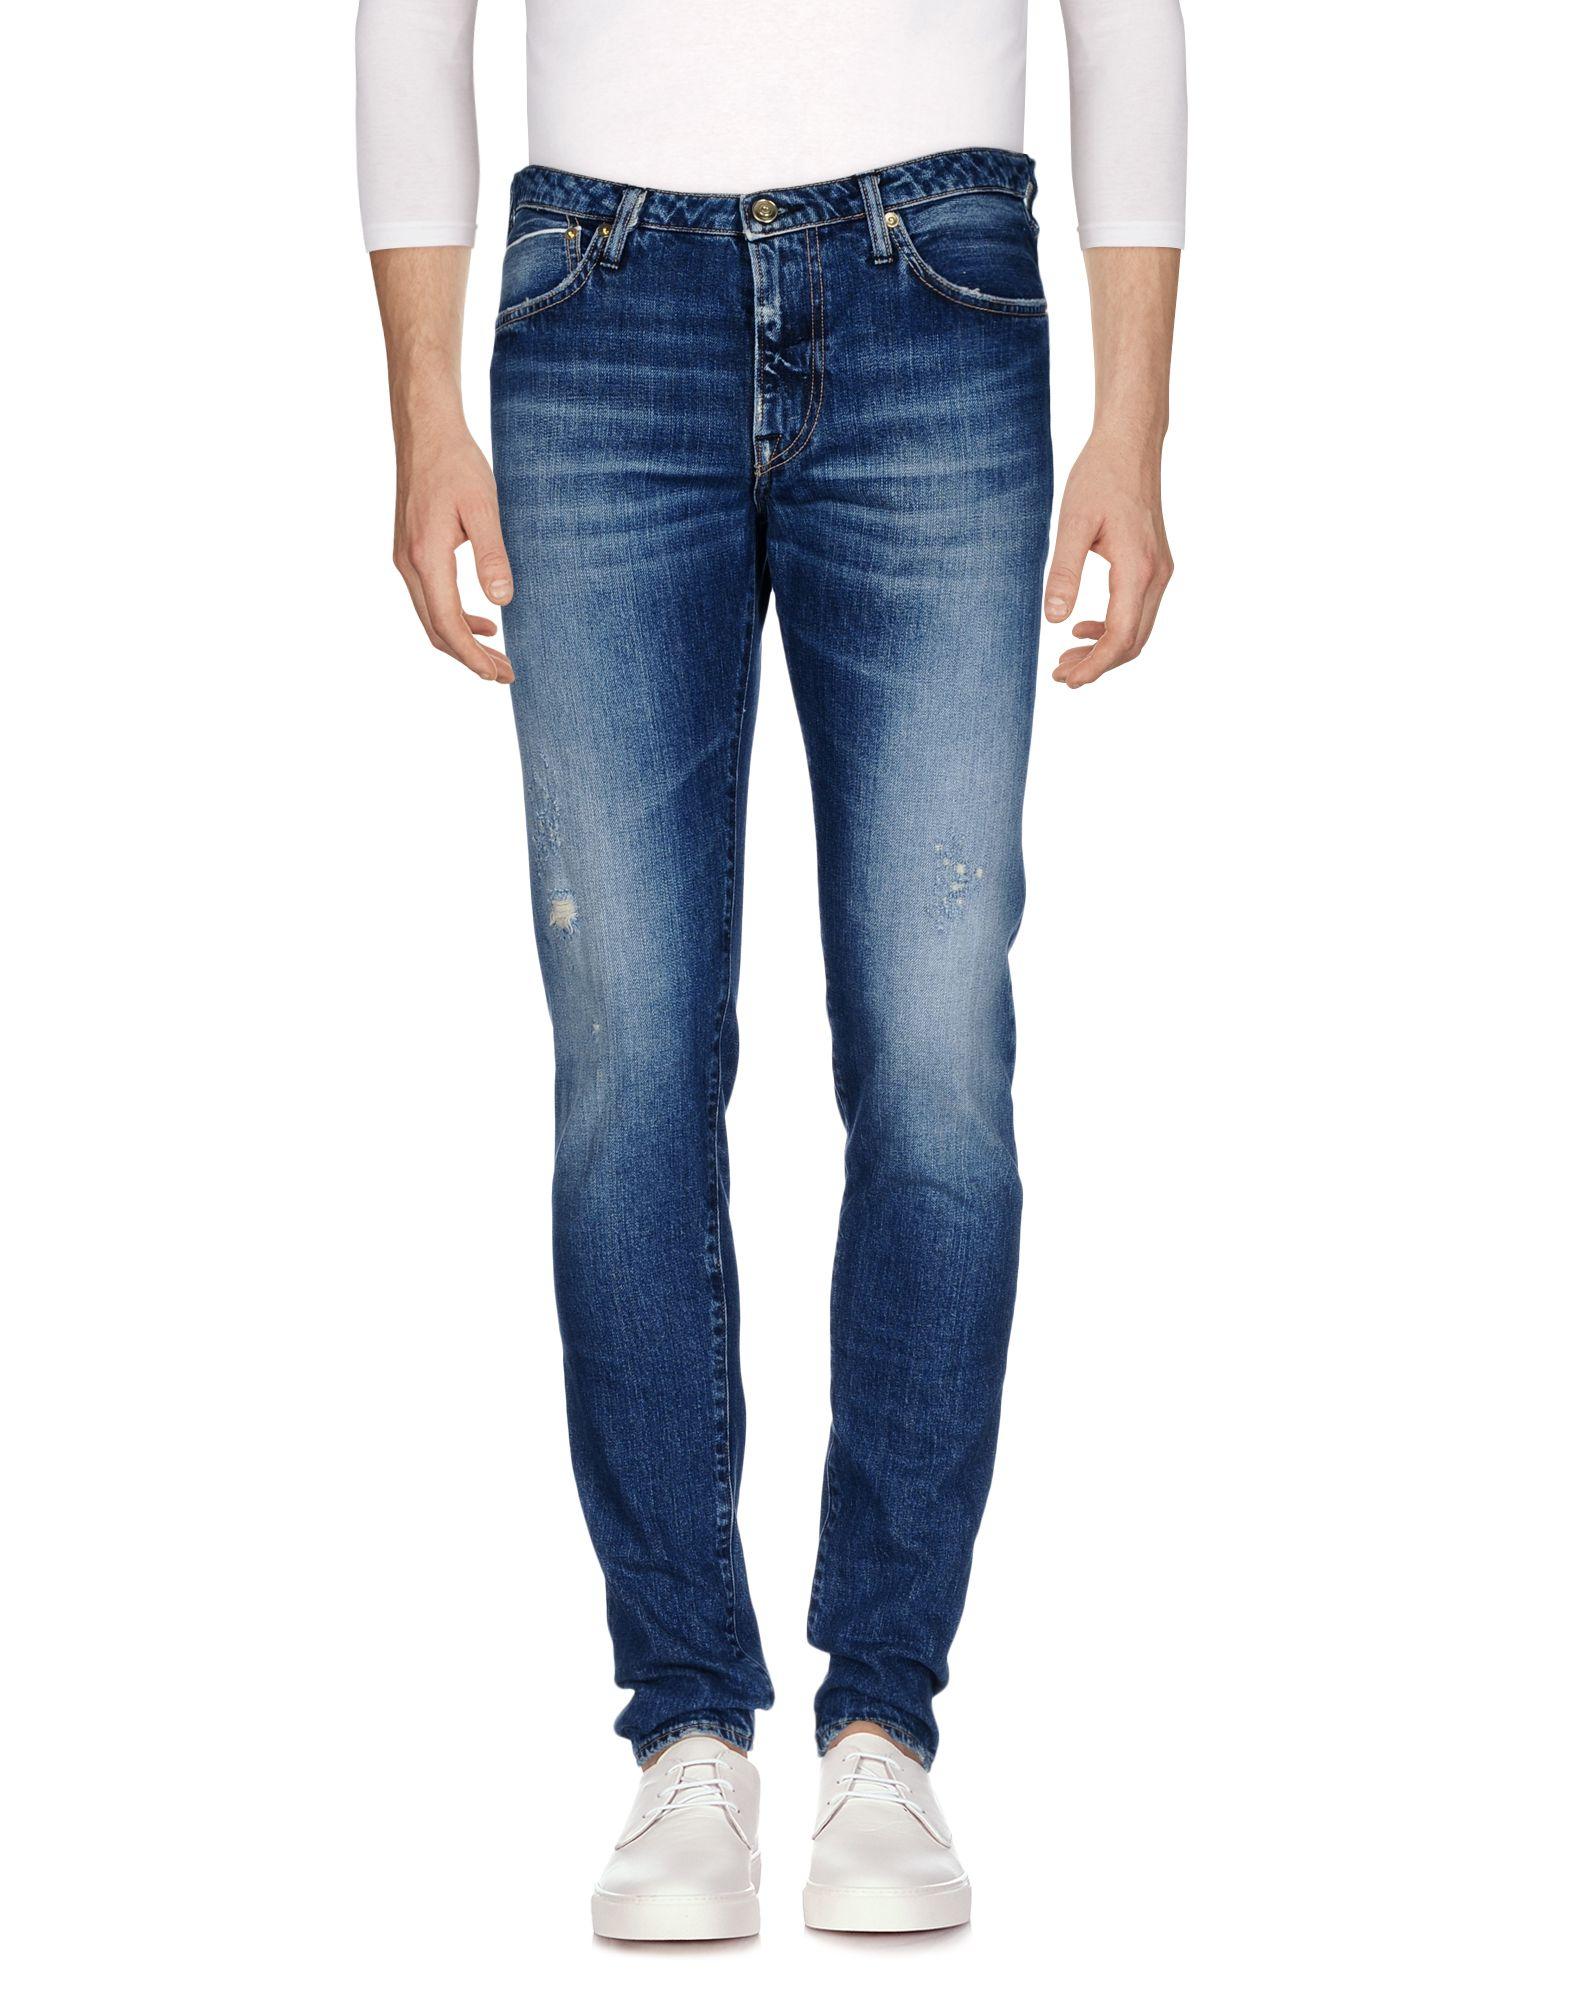 Pantaloni Jeans People Lab. Donna - Acquista online su